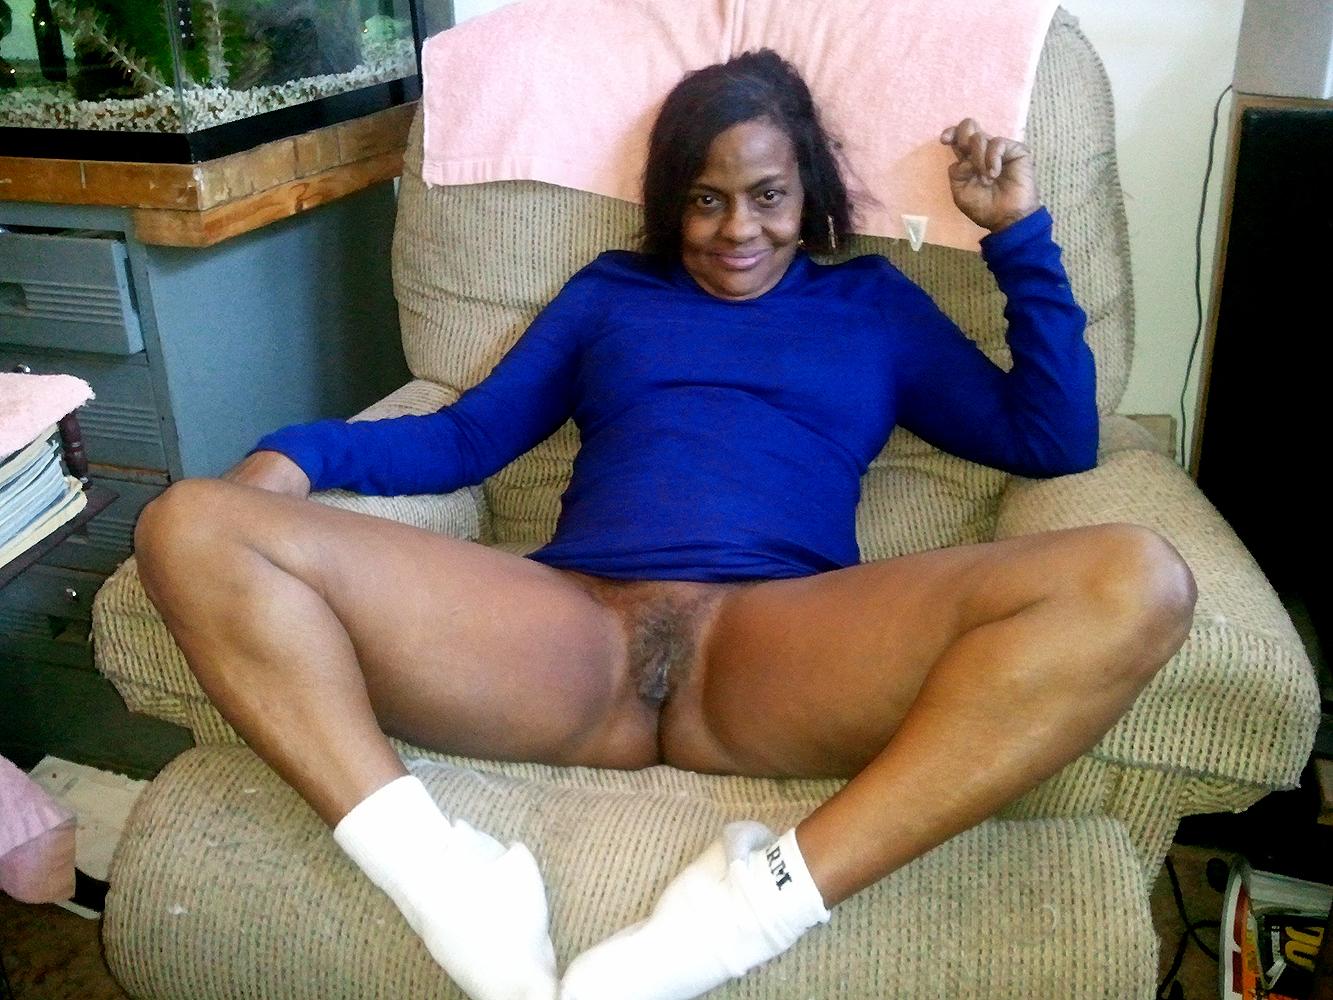 Grandma's Big Tits And Luscious Pussy Need